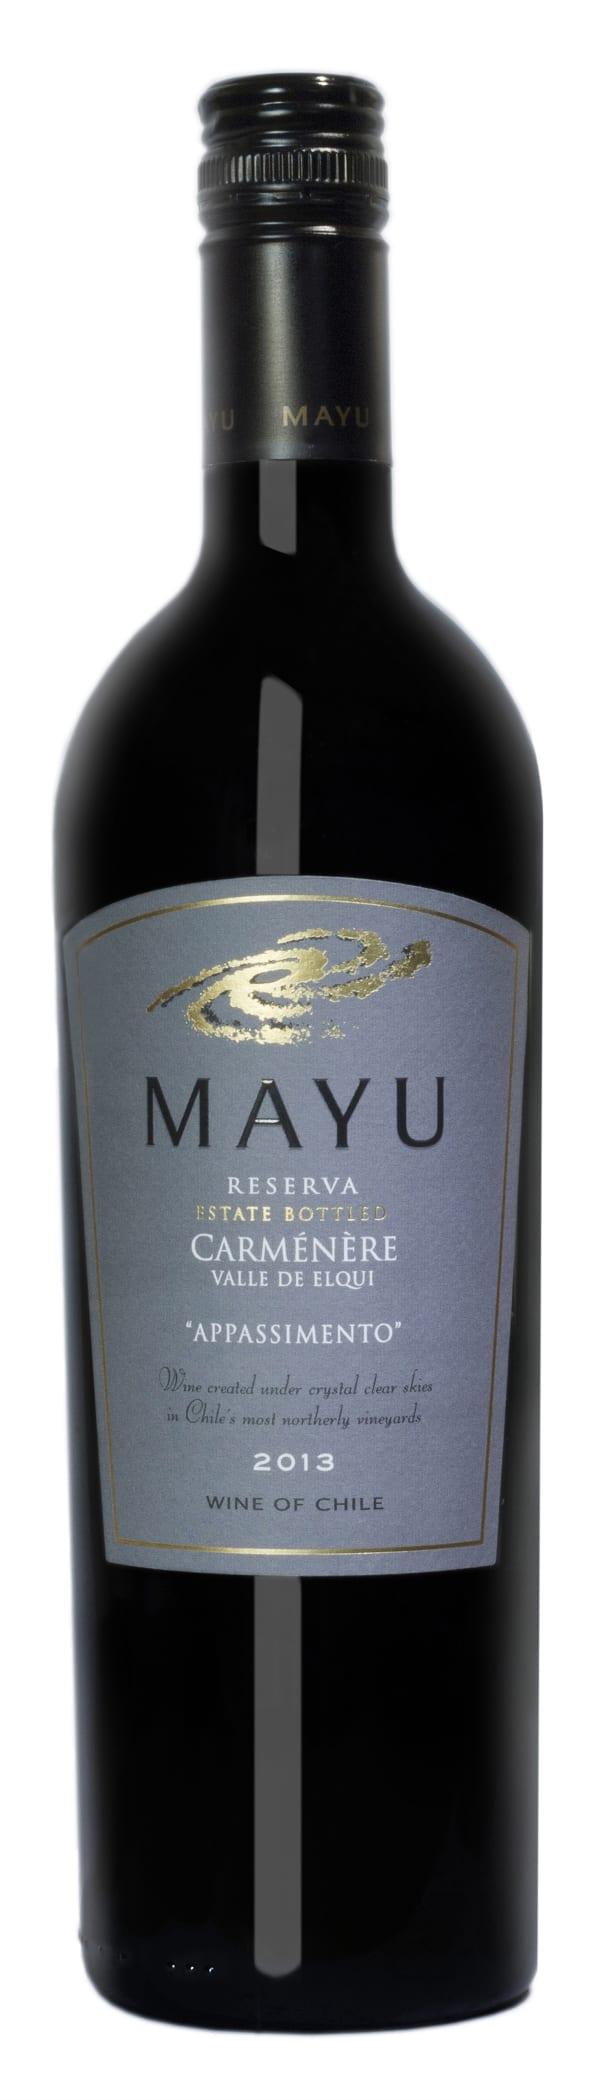 Mayu Reserva Carménère 2012